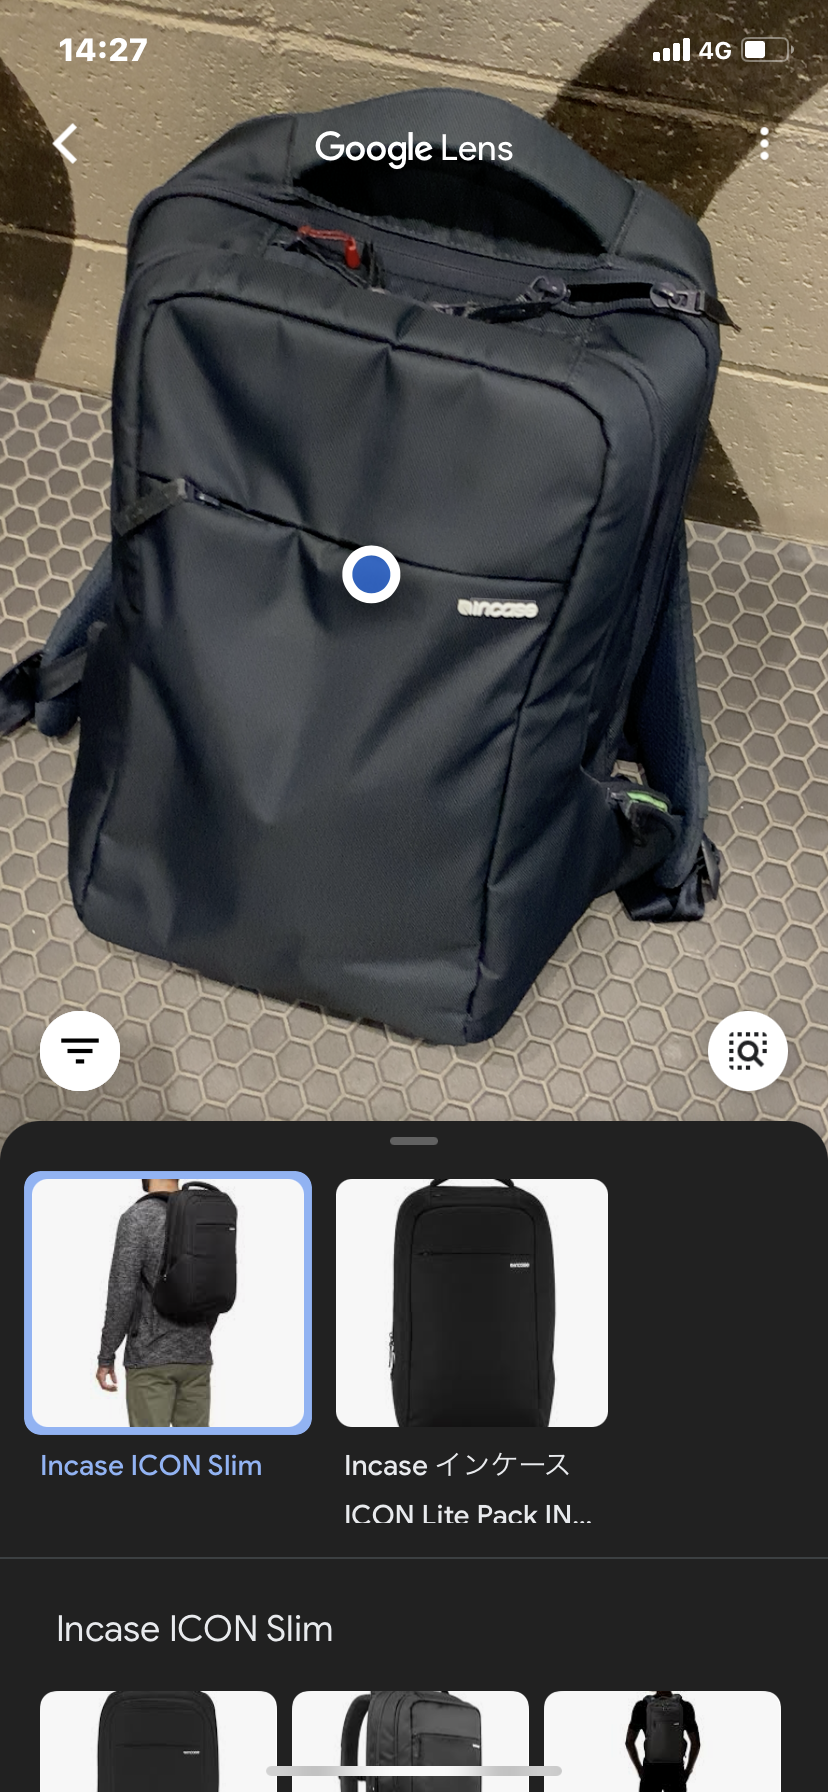 Googleレンズの画像